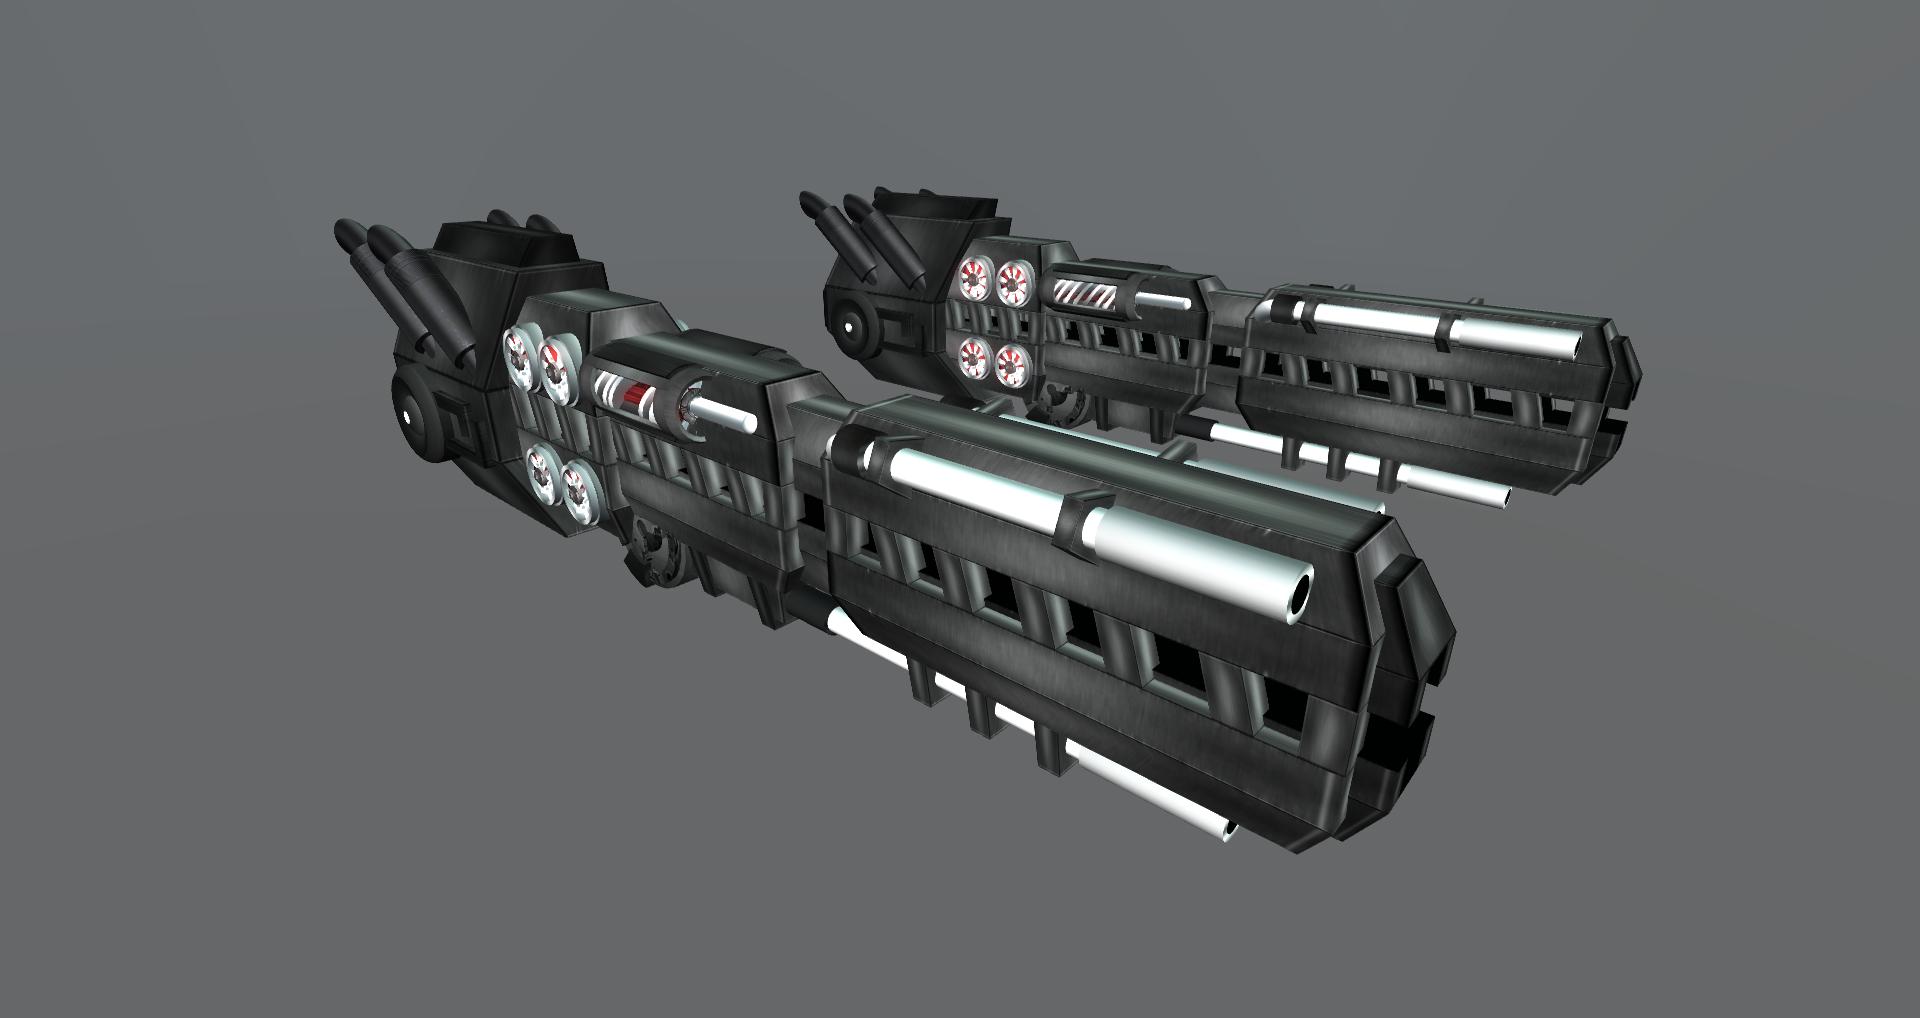 Futuristic Light Machine Gun | www.imgkid.com - The Image ...